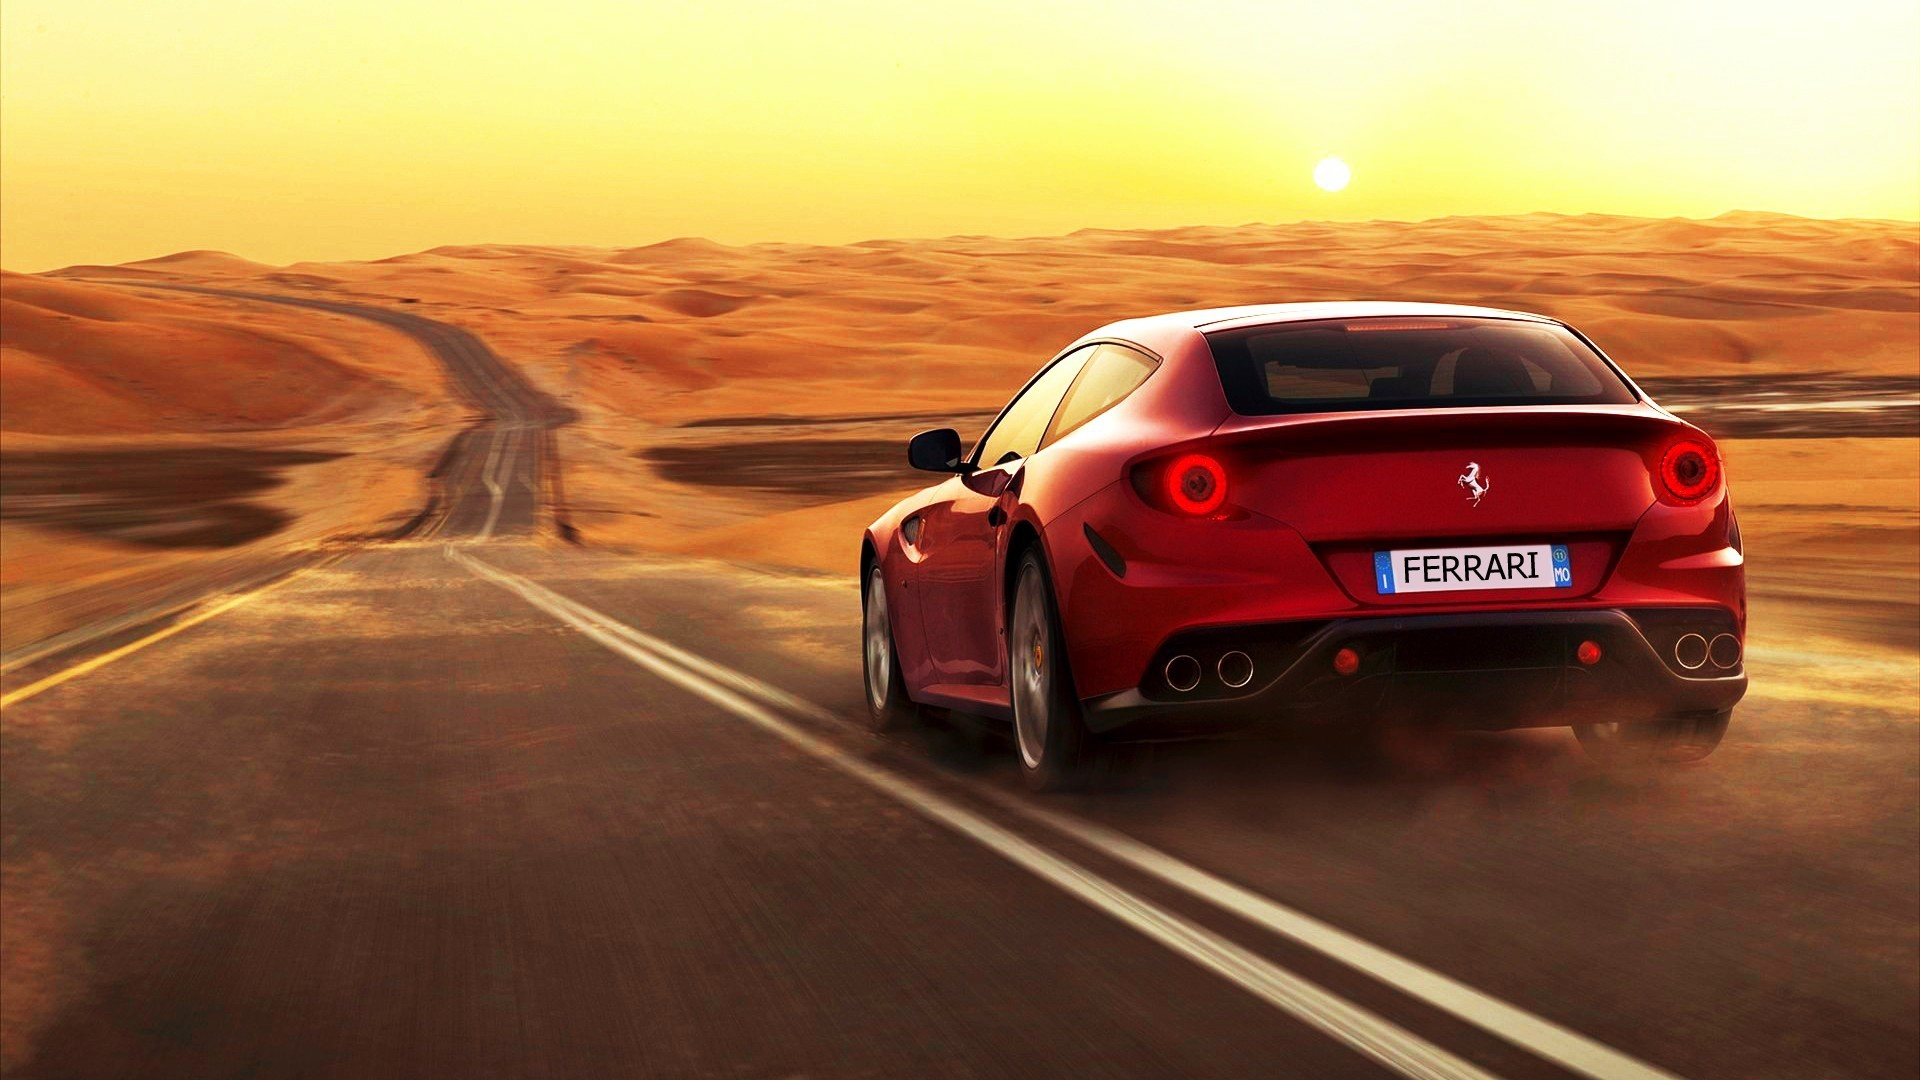 Imagenes De Ferrari Wallpapers 30 Wallpapers Adorable Wallpapers